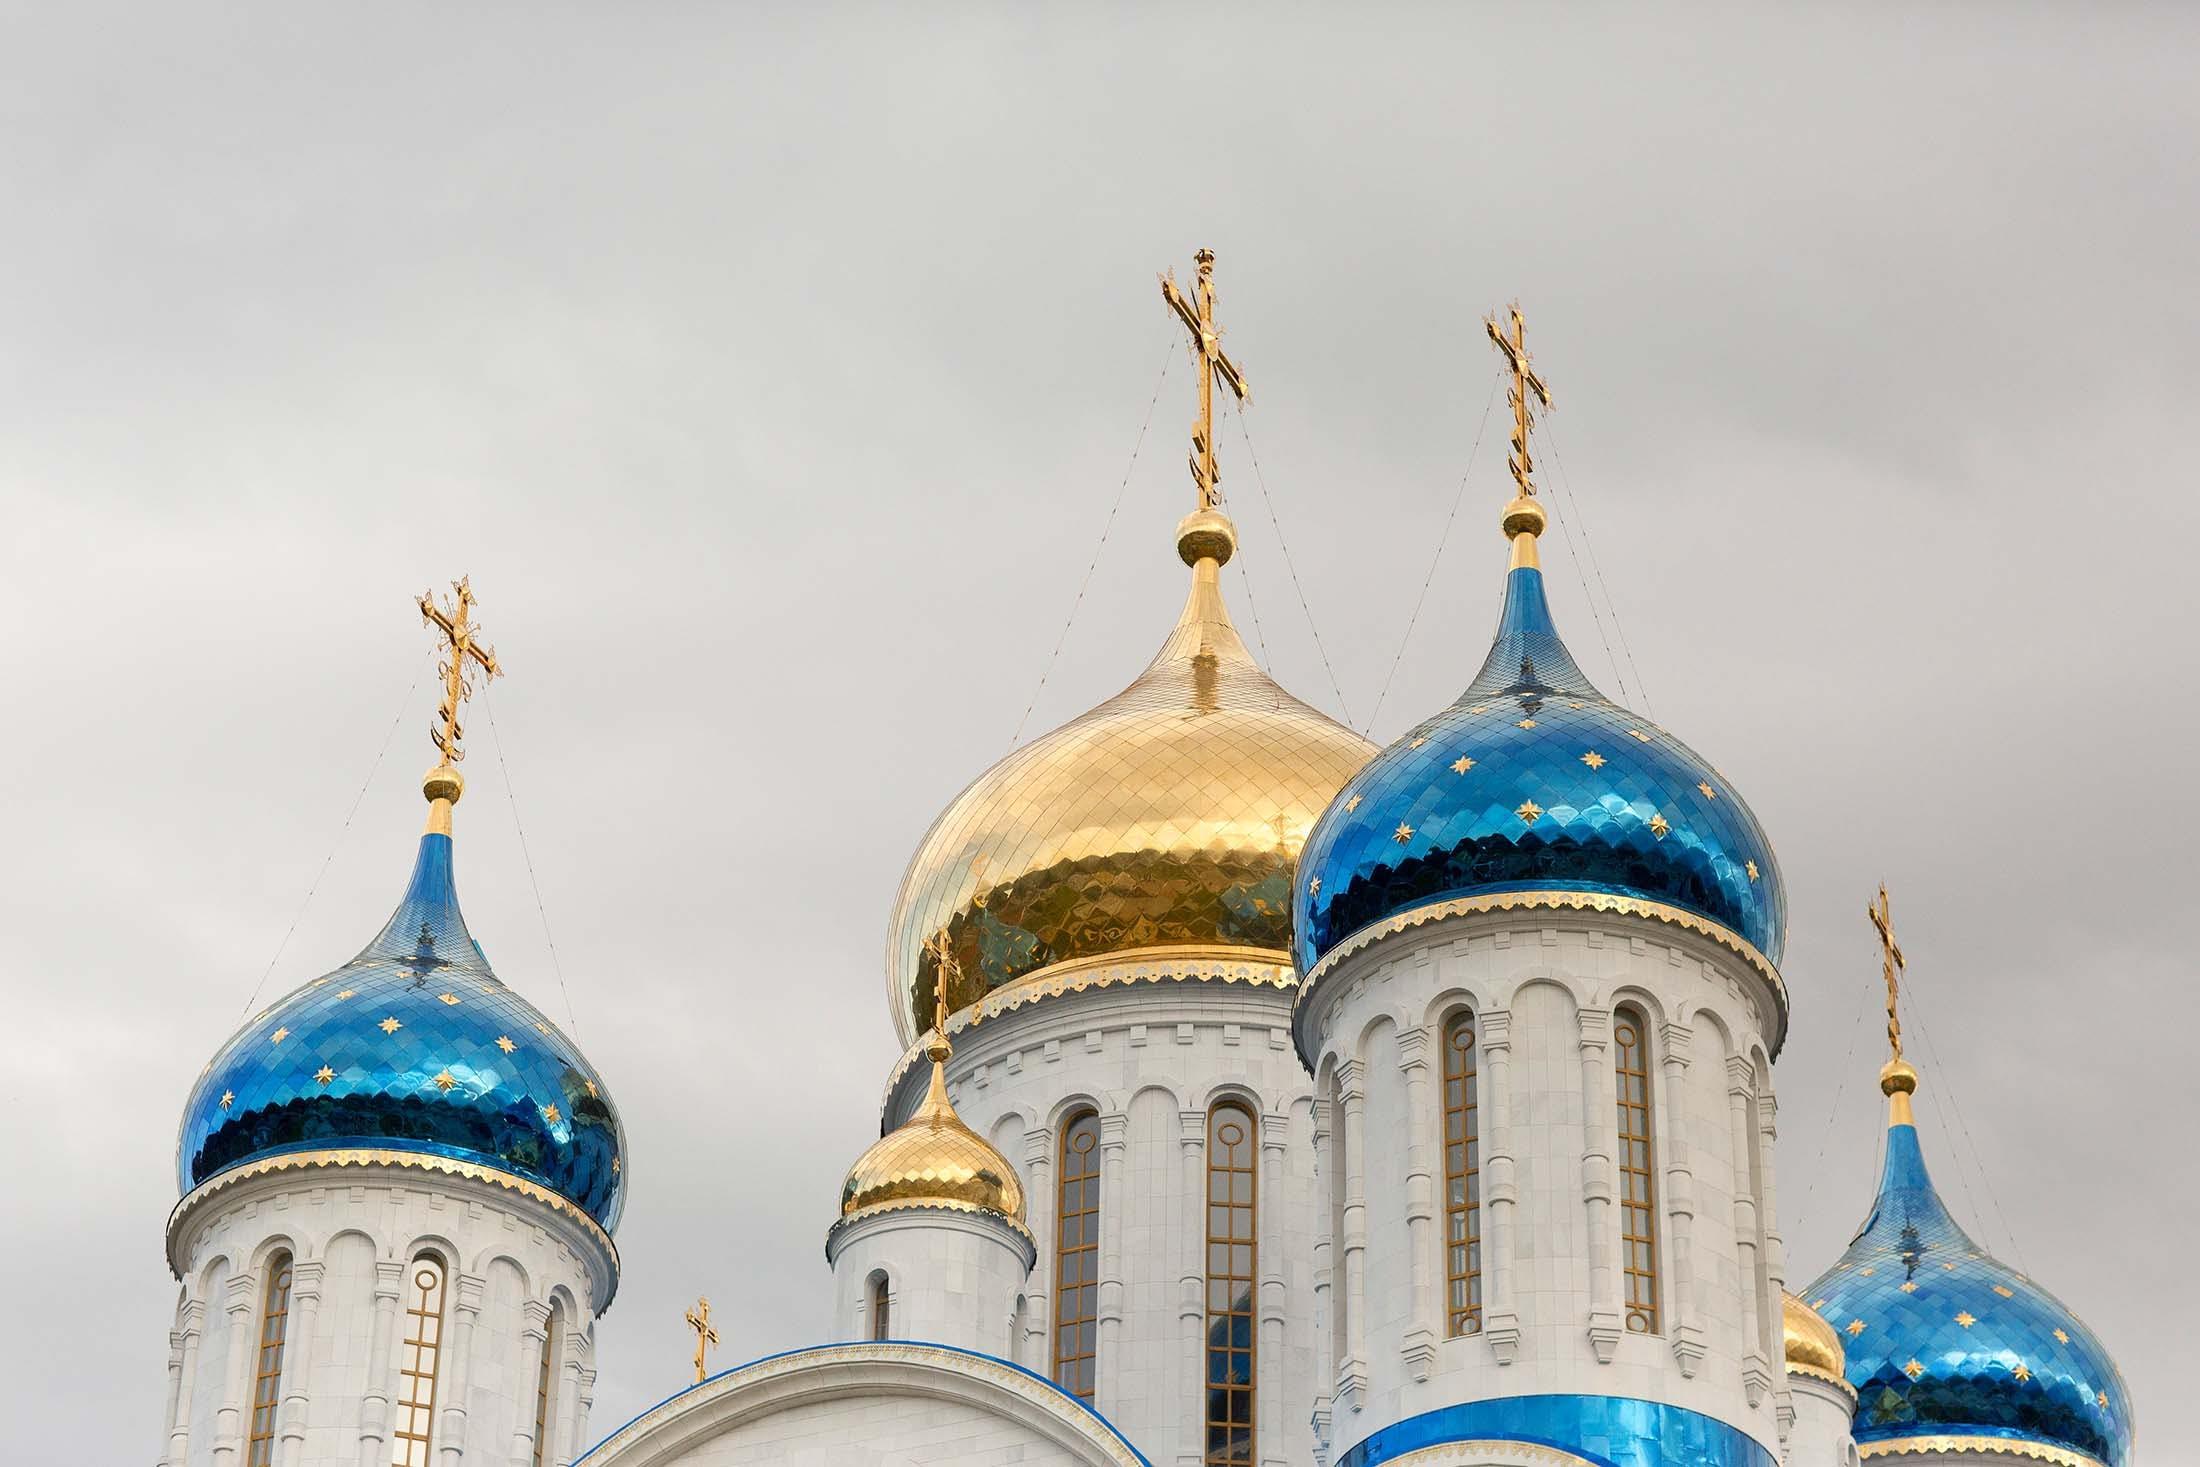 Gold in Russian Orthodox - Korsakov, Russia